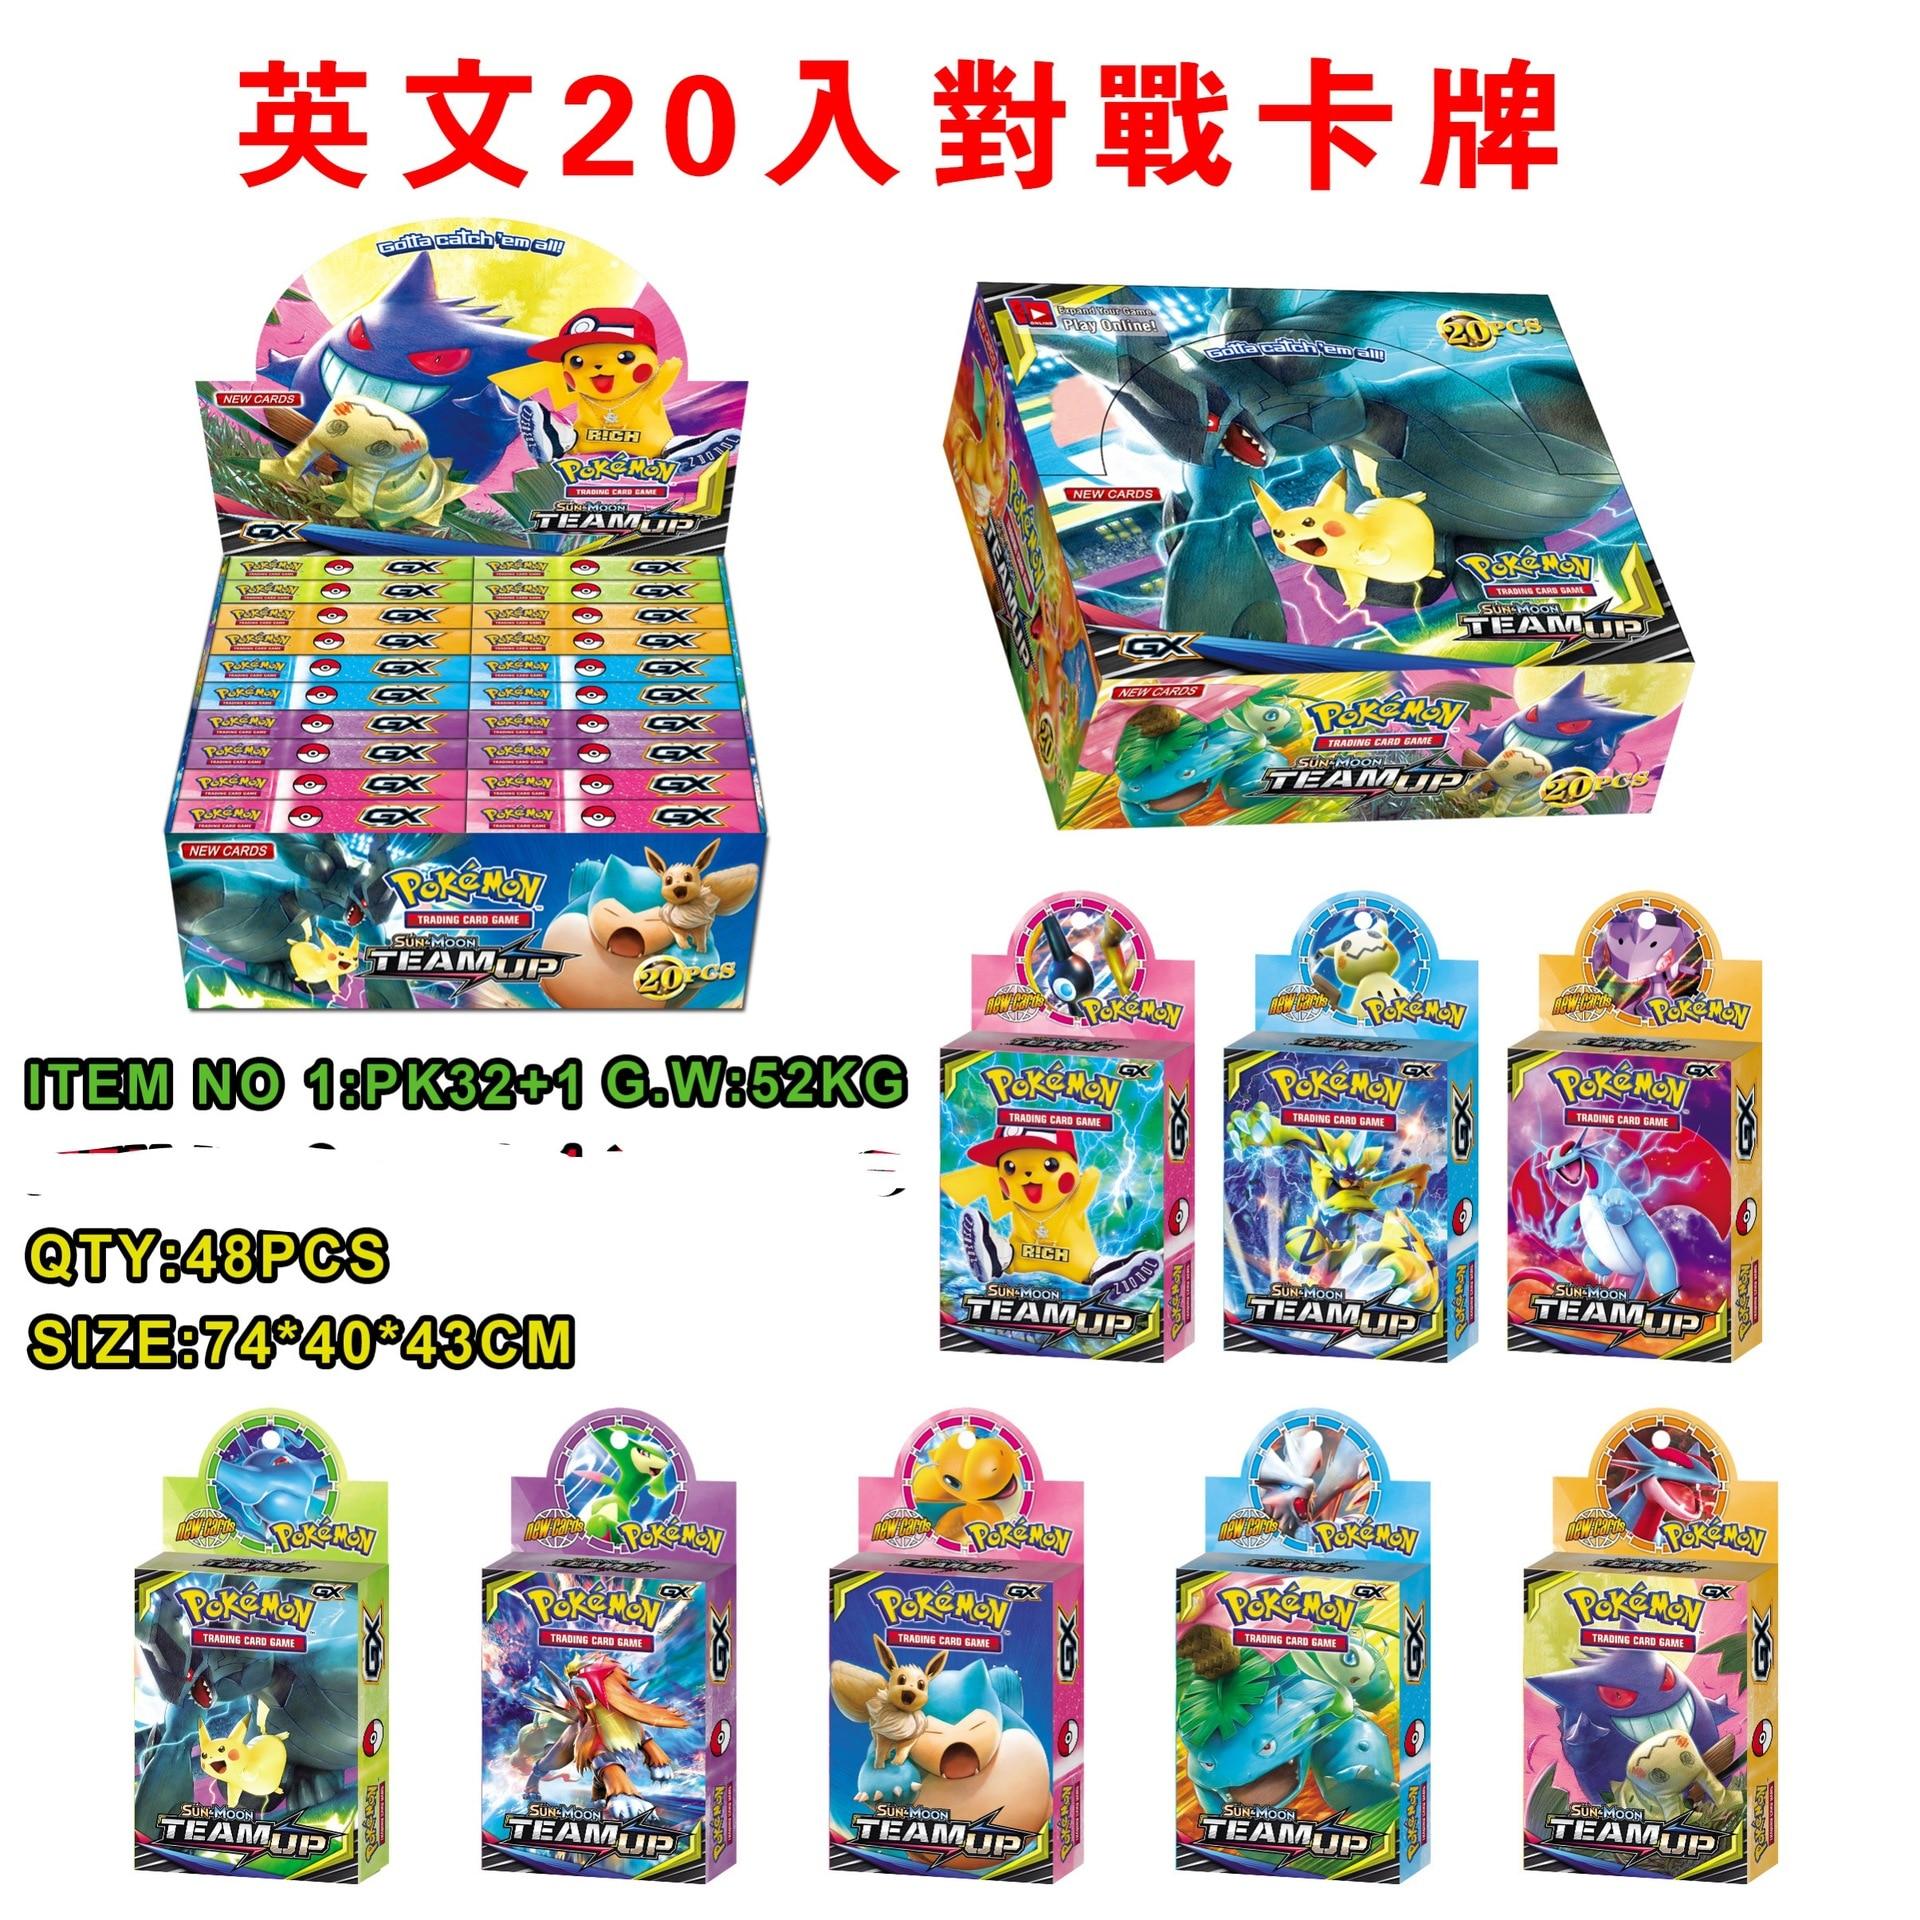 500pcs Newest TAKARA TOMY Pet Pokemon Cards Contain Flash Card Pokemon TEAM UP Cards   Kids Toys  Pokemon Cards Gx